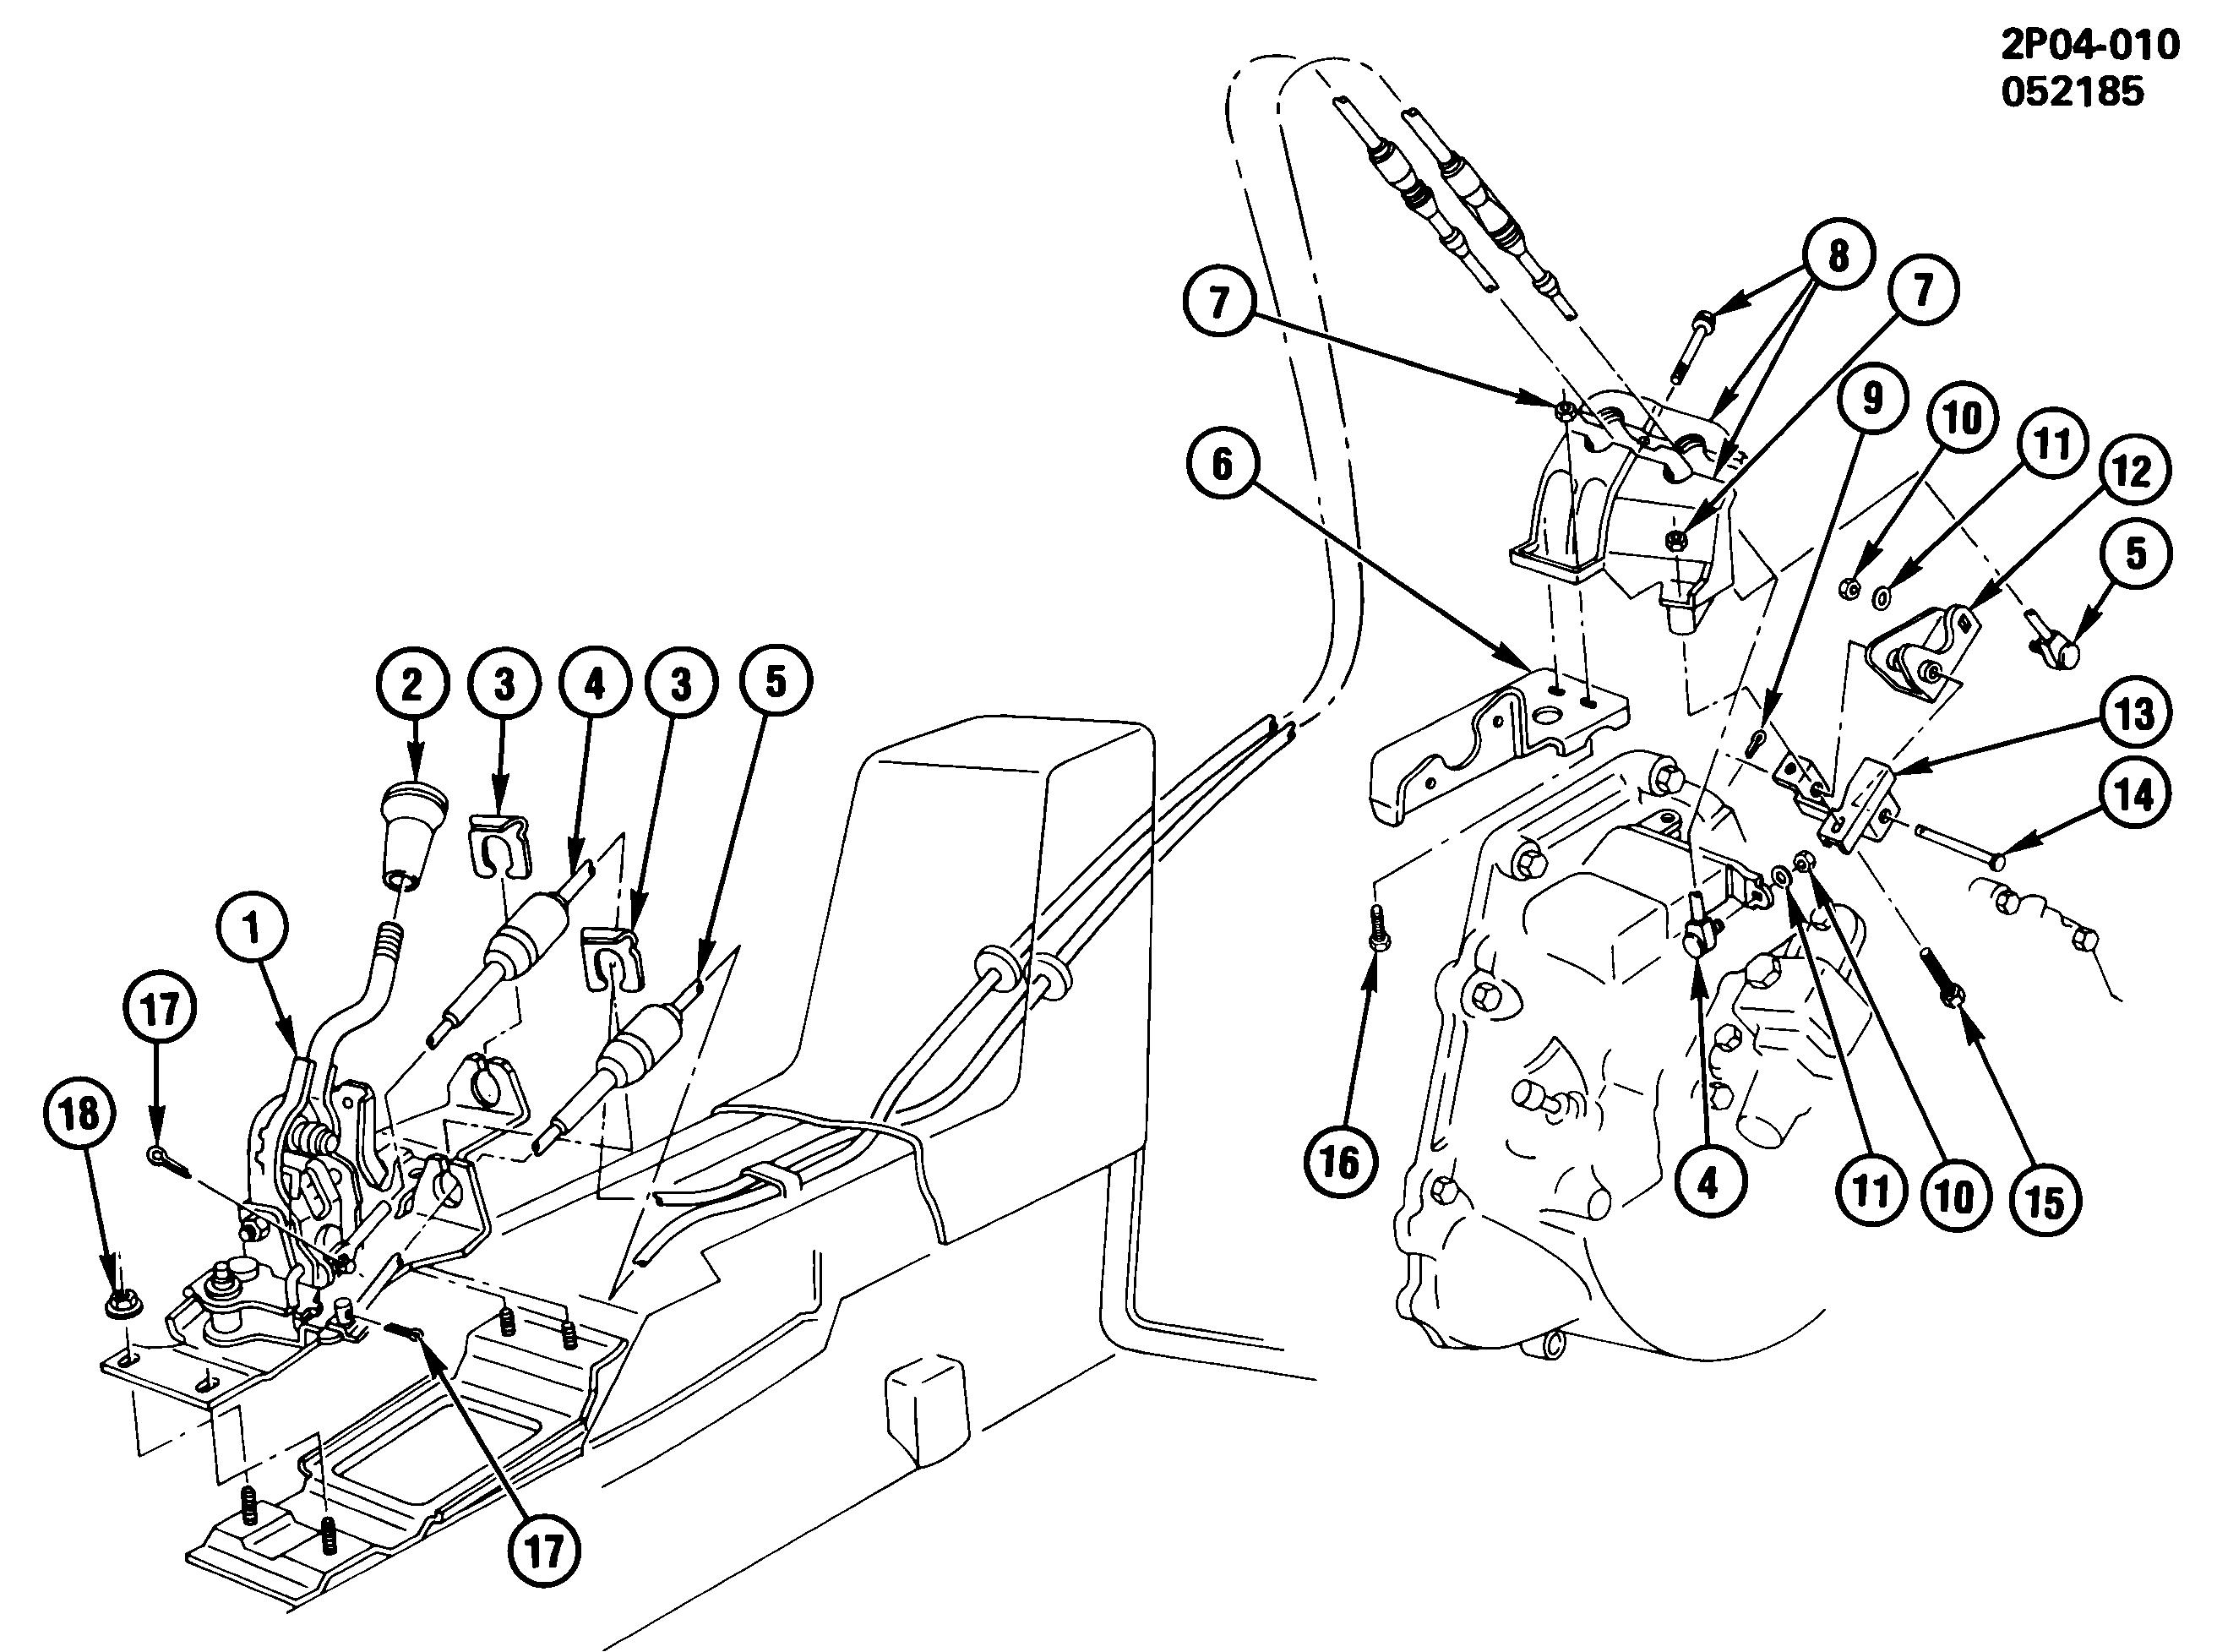 Fiero Parts Diagram Wiring Schematics Backup Light Diagrams Pontiac P Shift Controls Manual Transmission Floor Mt2 Racing